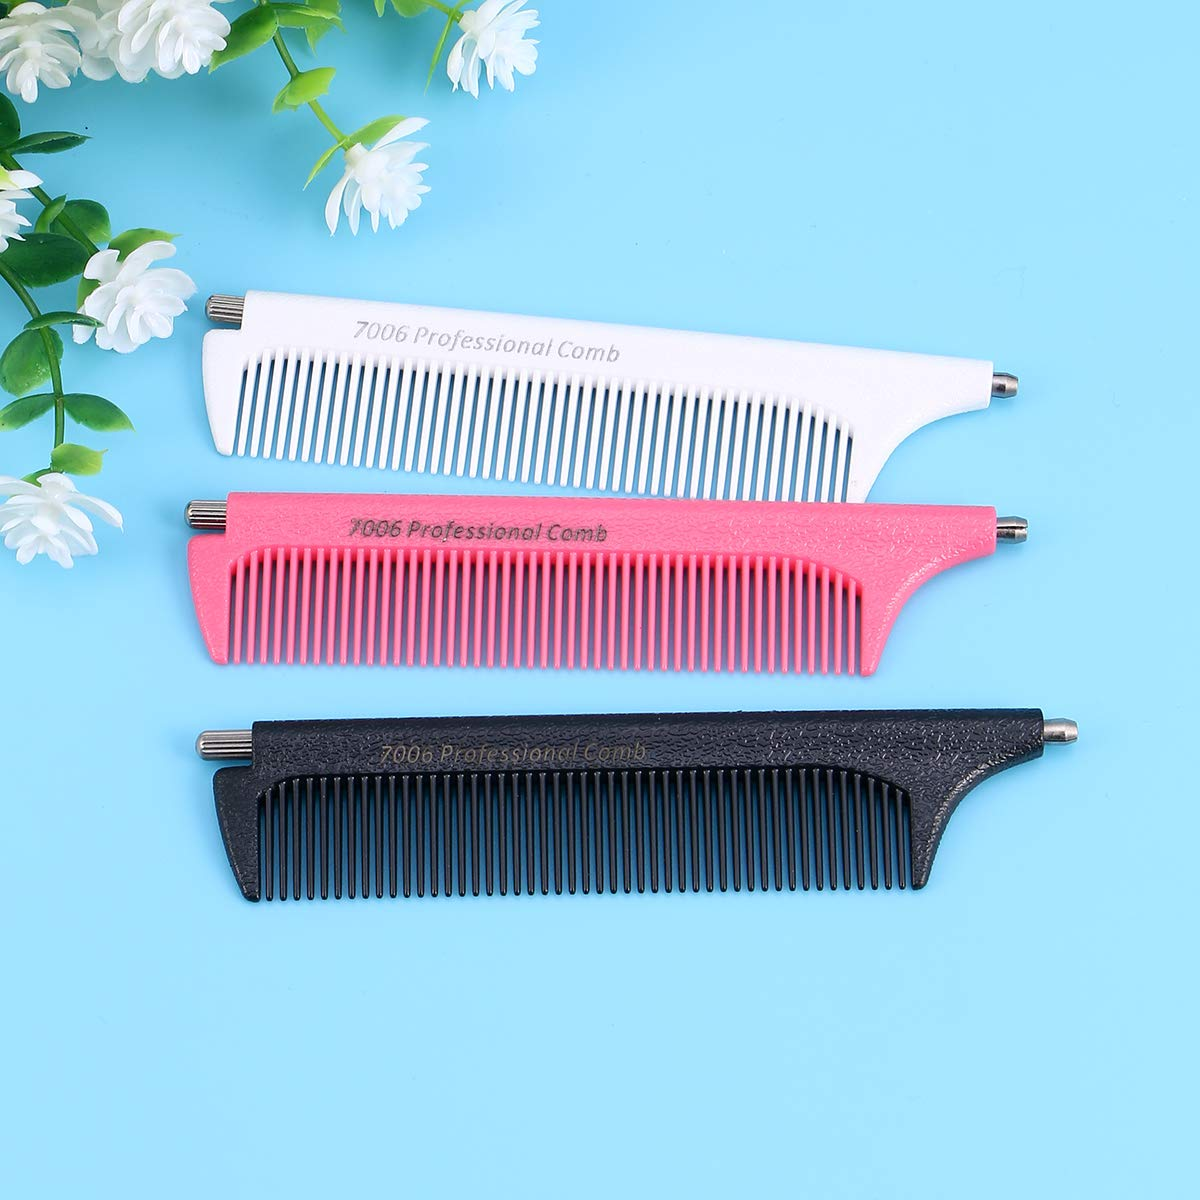 SUPVOX 3pcs pin tail comb fiber anti static heat resistant comb